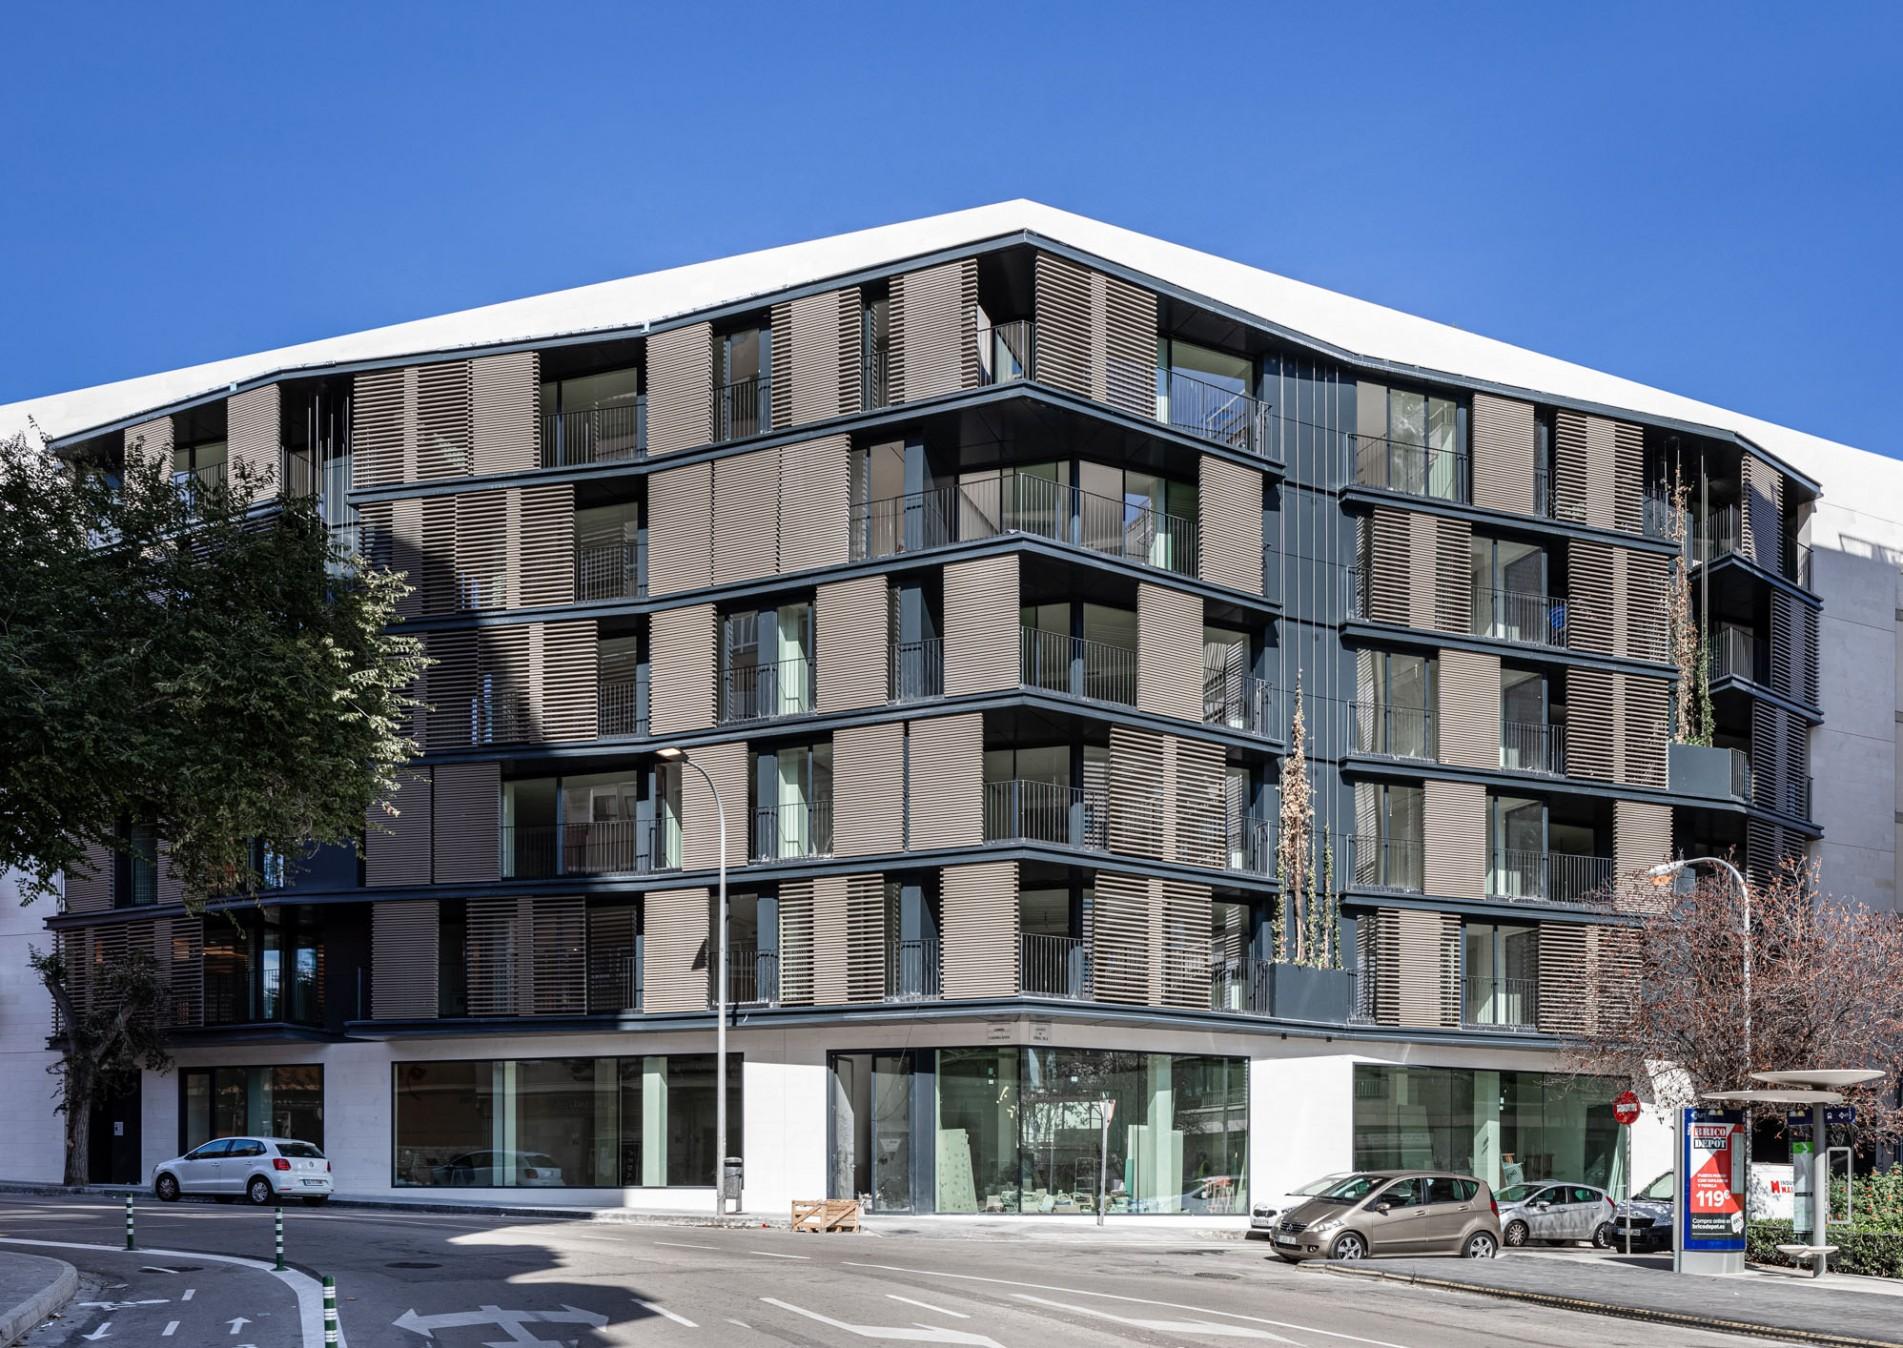 grupo-ferra-constructora-calida-residencial-lujo-doria-palma-slide.jpg